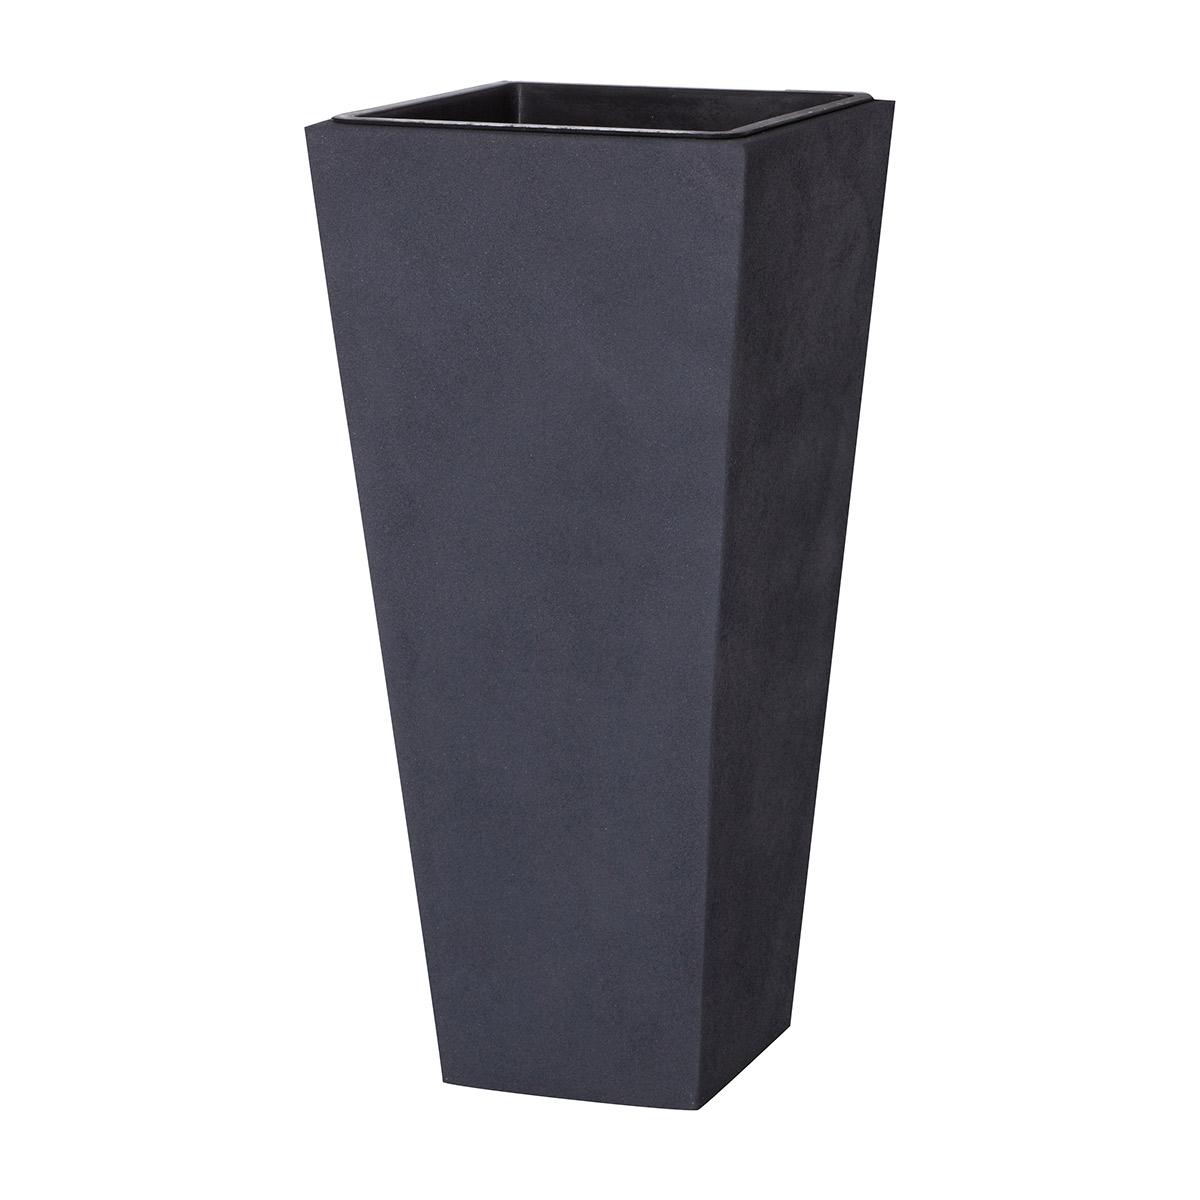 pflanzk bel fiberglas 28 x 28 x 60 cm sandstrahloptik kunststoffeinsatz grau gartenfreude. Black Bedroom Furniture Sets. Home Design Ideas